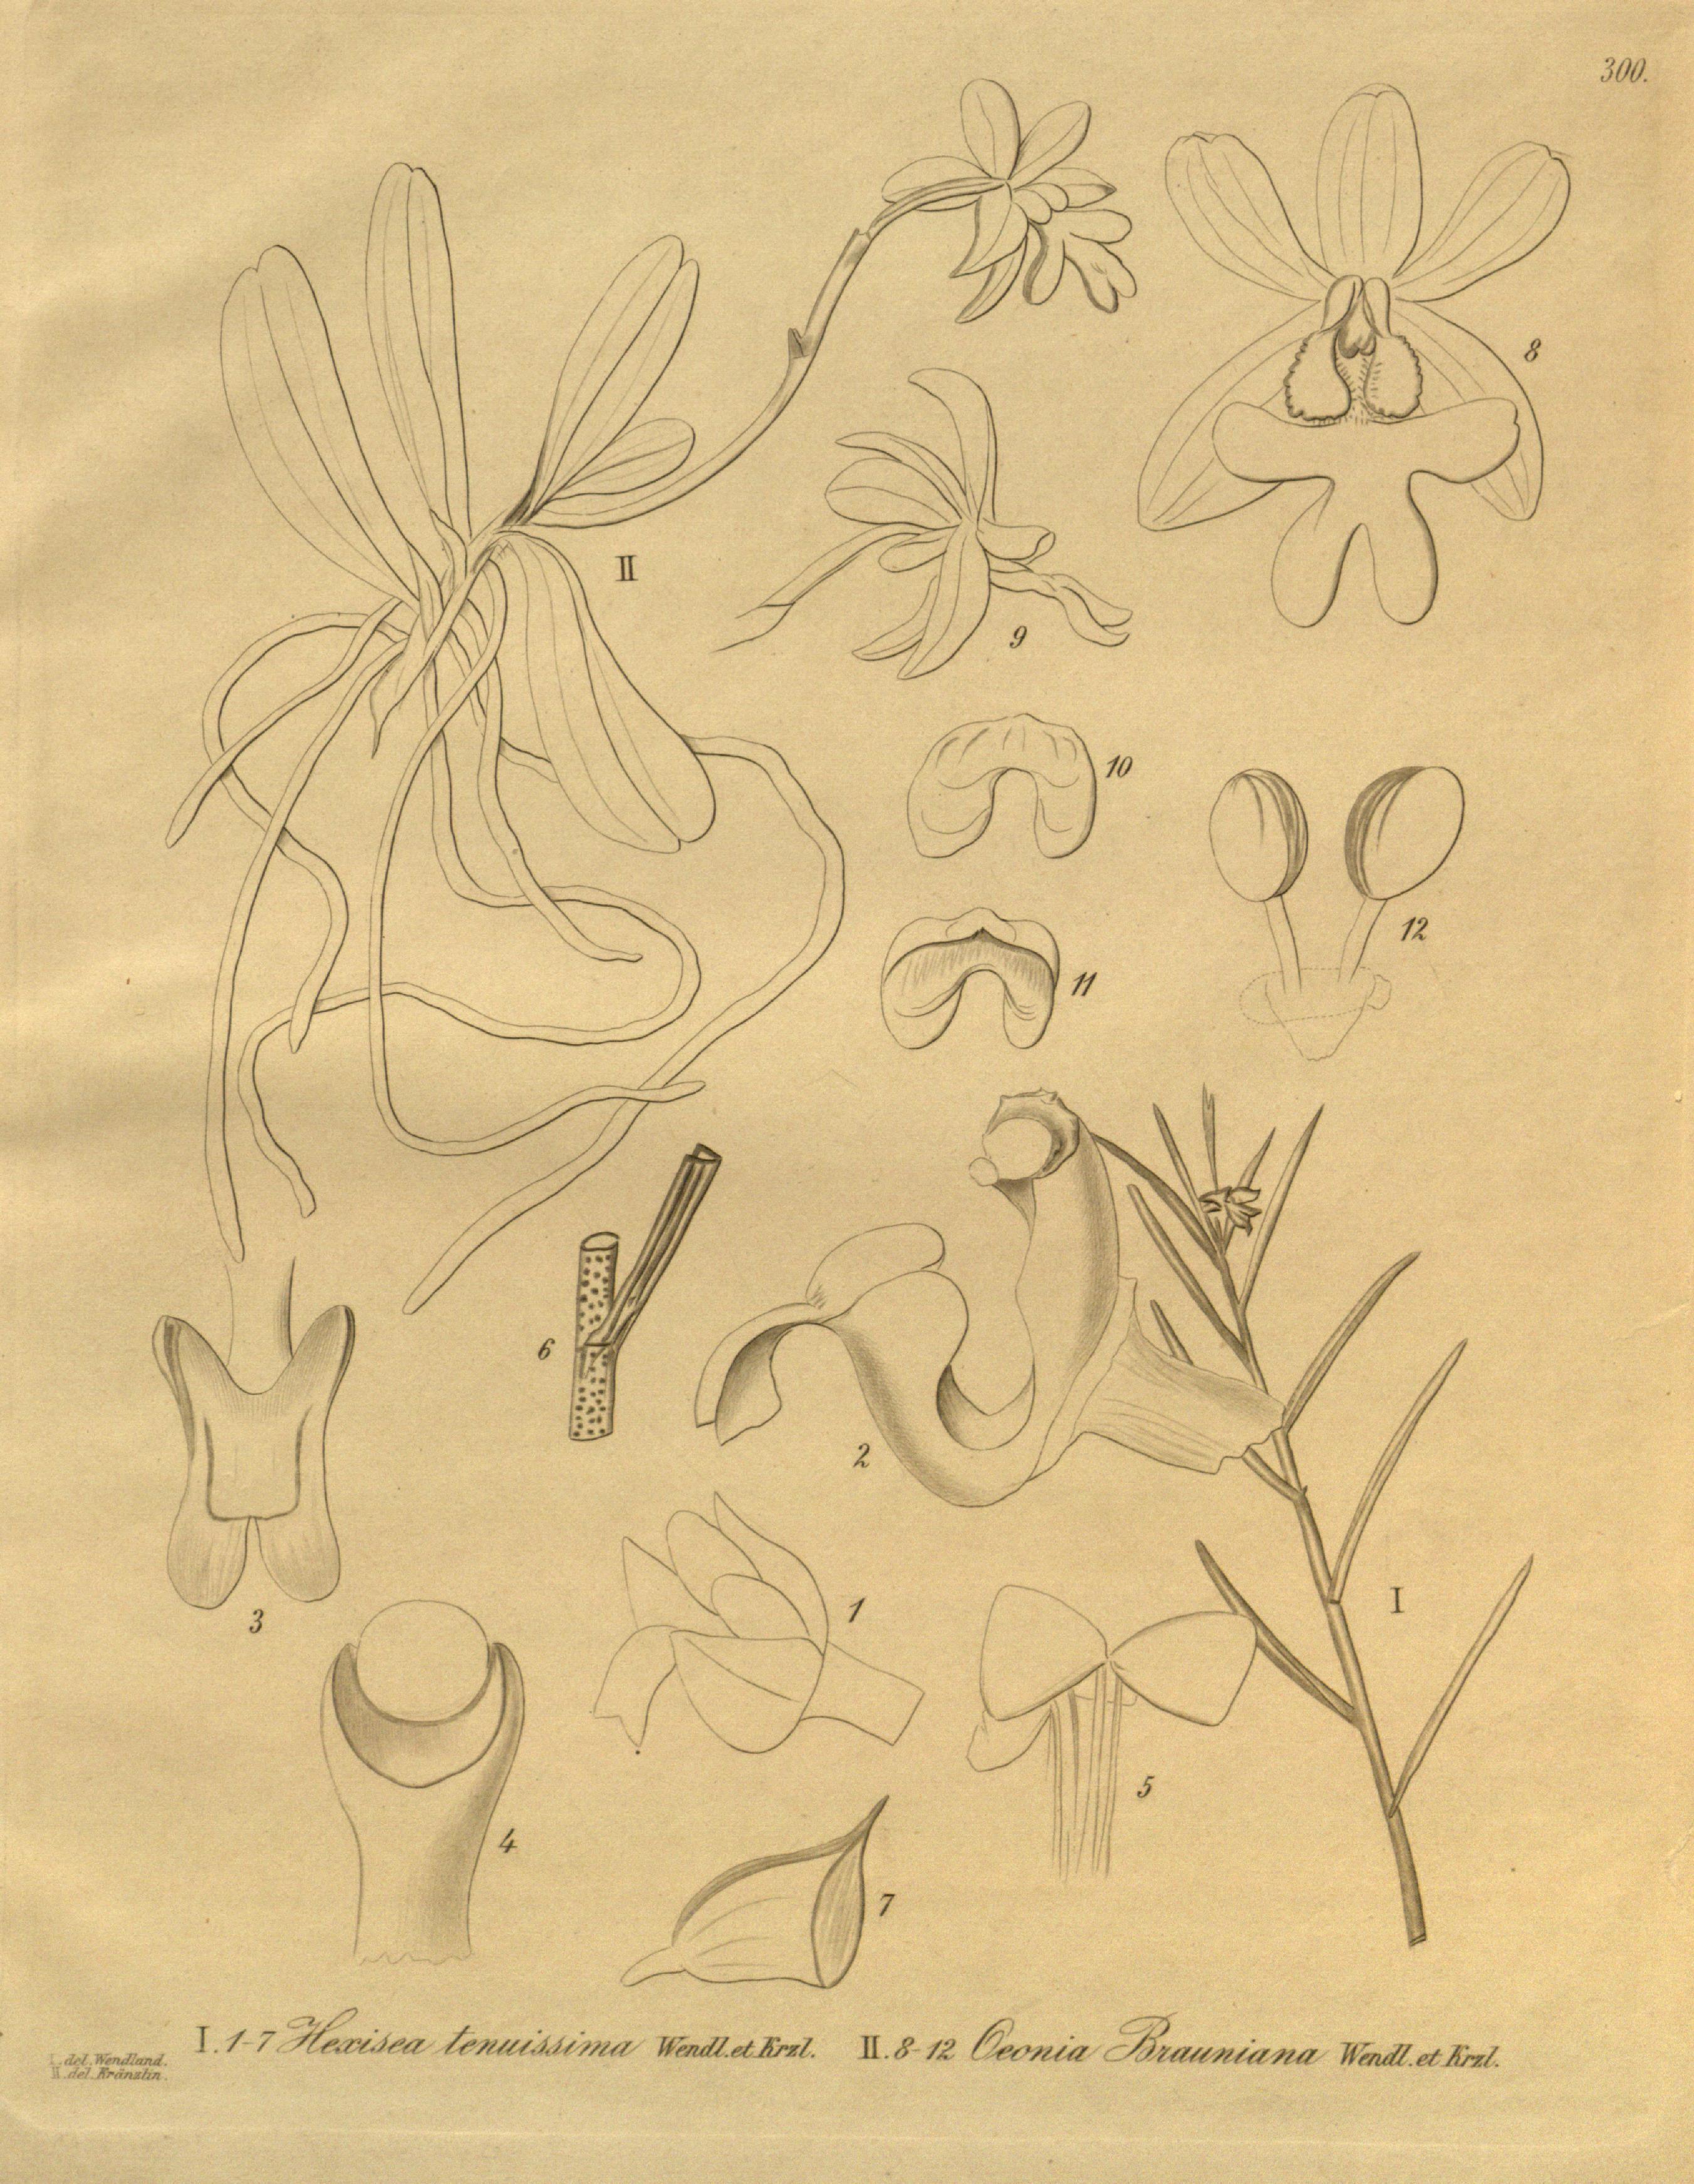 Image of Oeonia